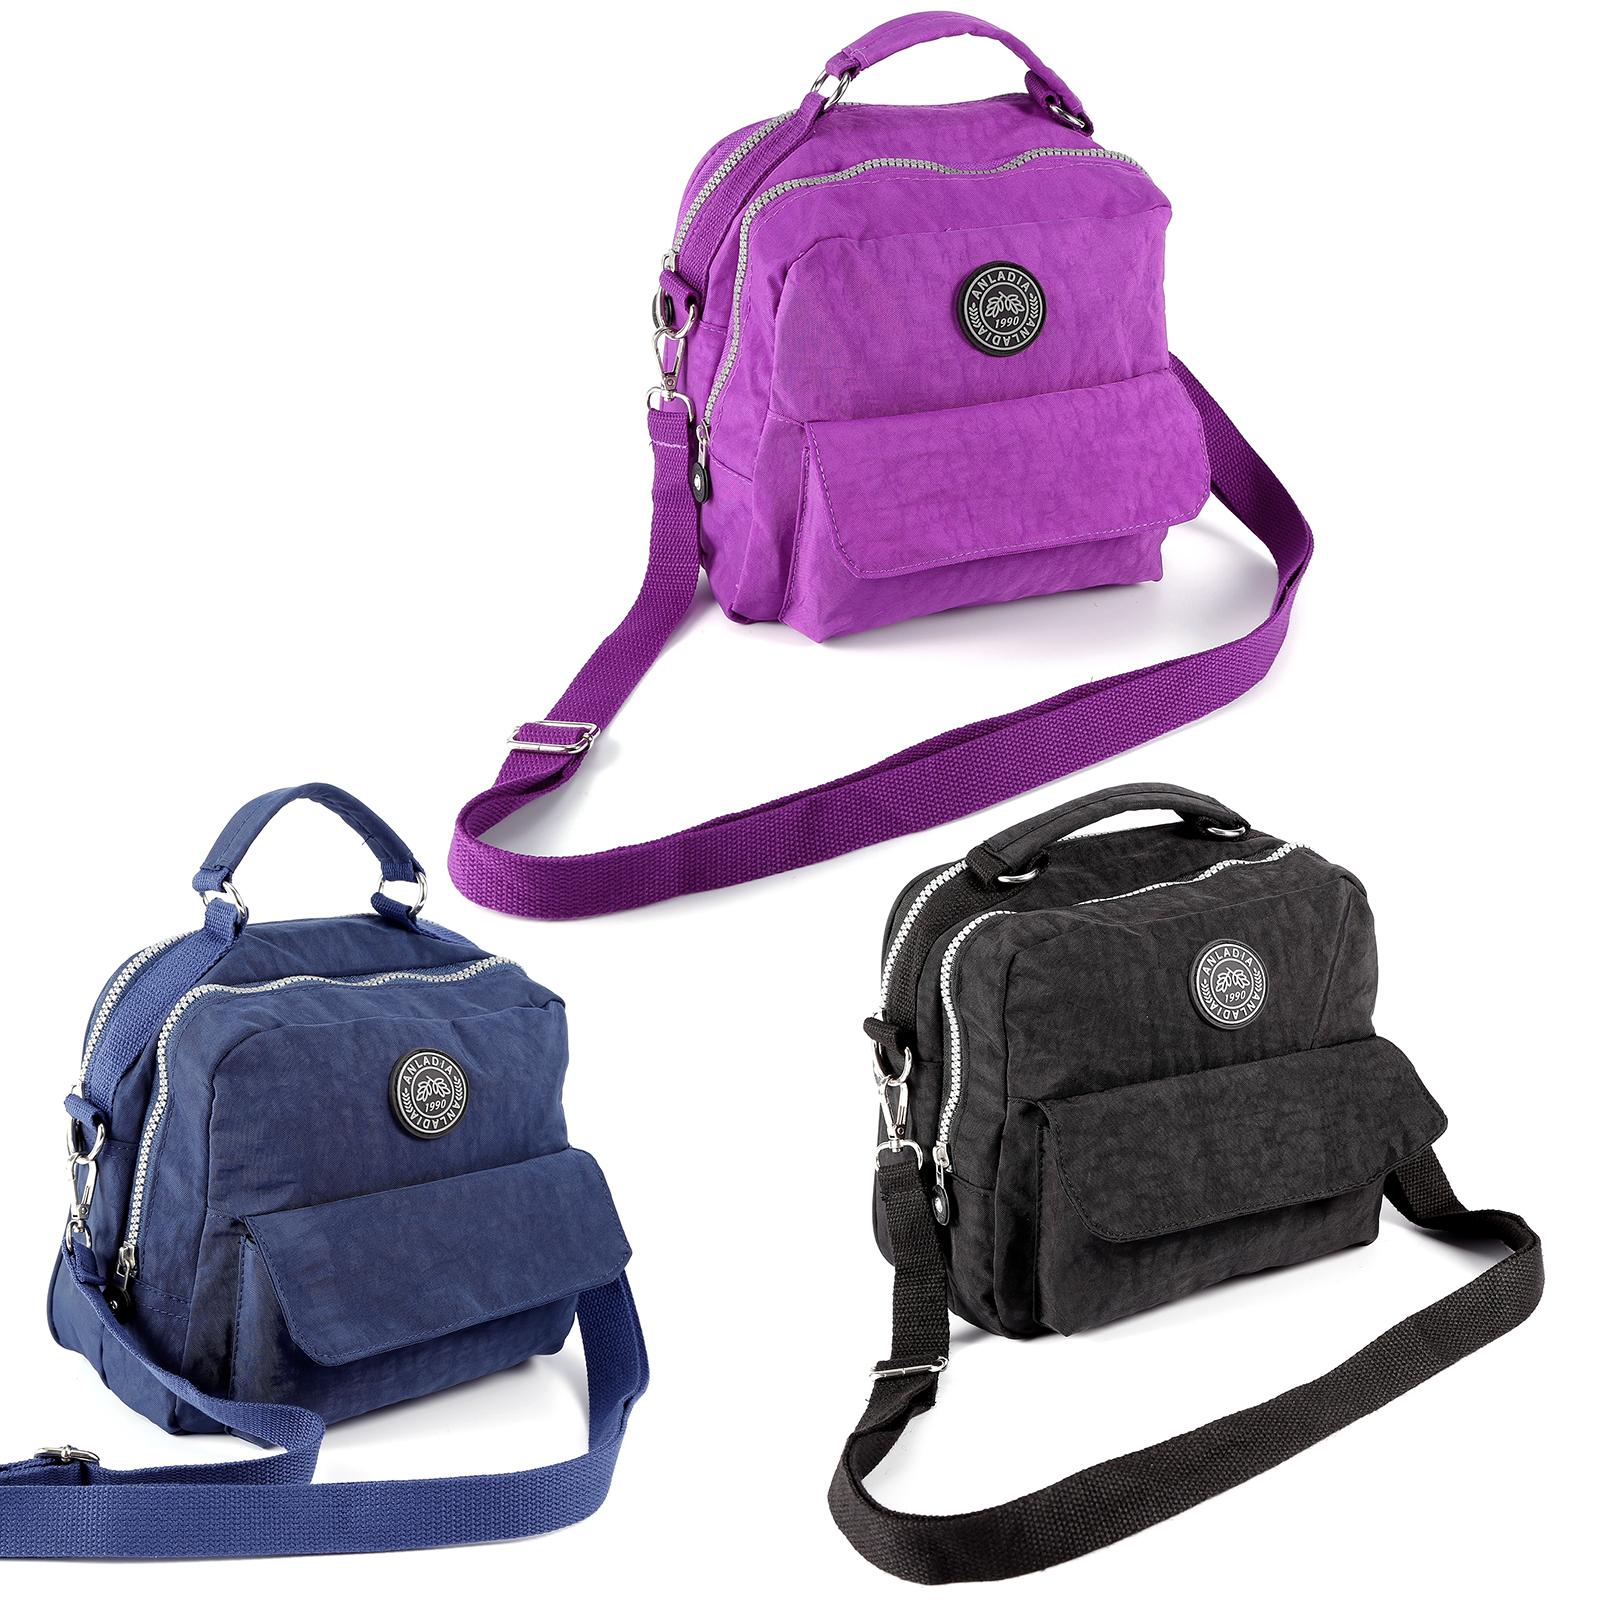 36d07f4e7dd7 Women's Shoulder Bags Casual Handbag Travel Bag Messenger Cross Body ...